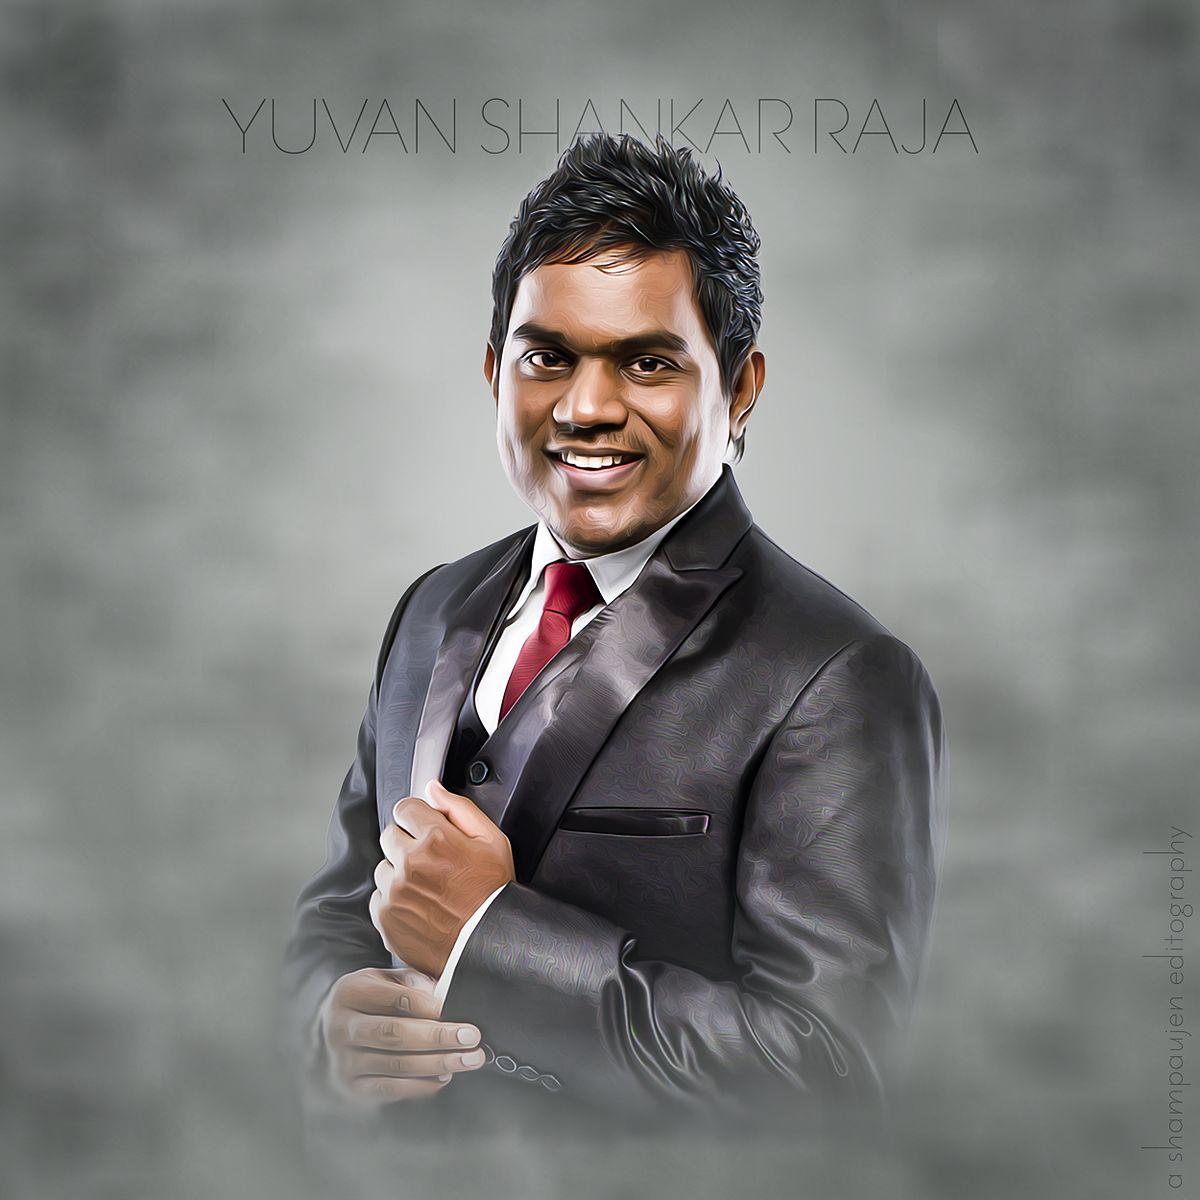 Yuvan Shankar Raja - Hits List 2 of 2 - - Download Tamil Songs